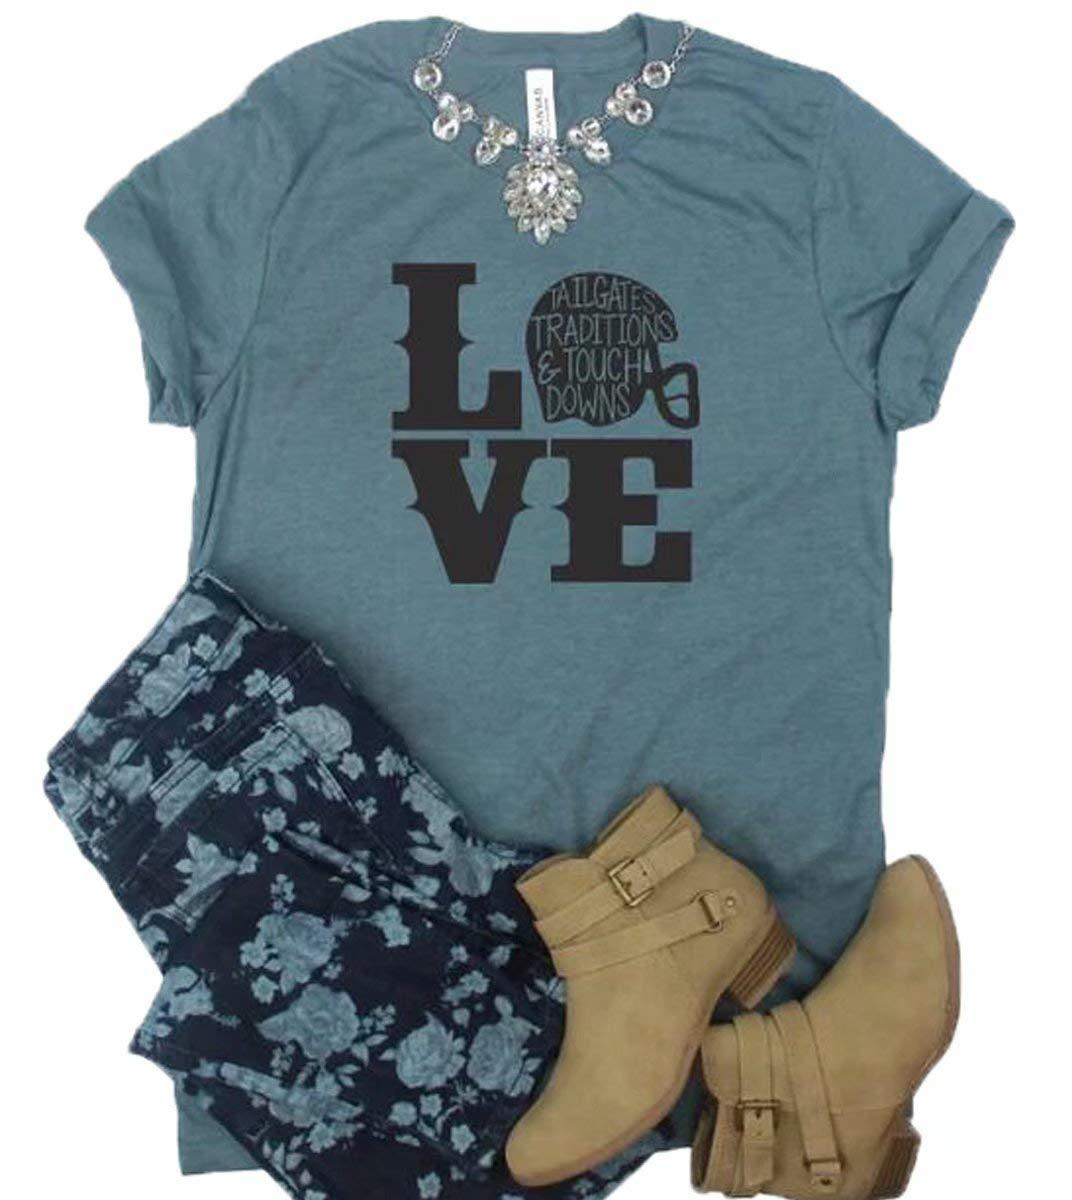 Love Football T Shirt Women Funny Cute Football Mom Graphic Tees Football Season Fall Shirt Tops